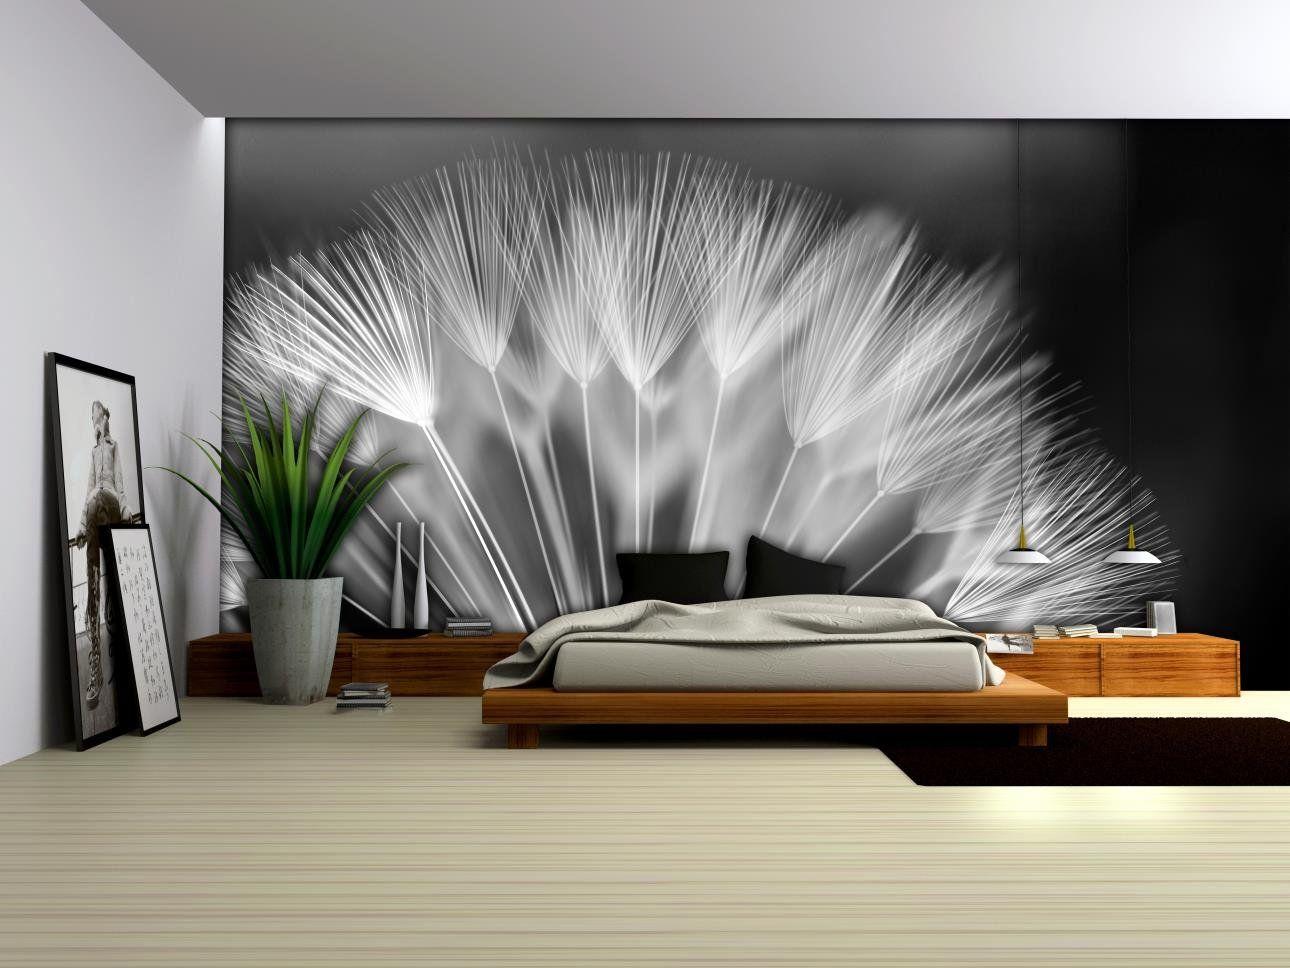 Wandtapete Schlafzimmer ~ Fototapete pusteblume poster wandbild bilder tapeten tapete foto